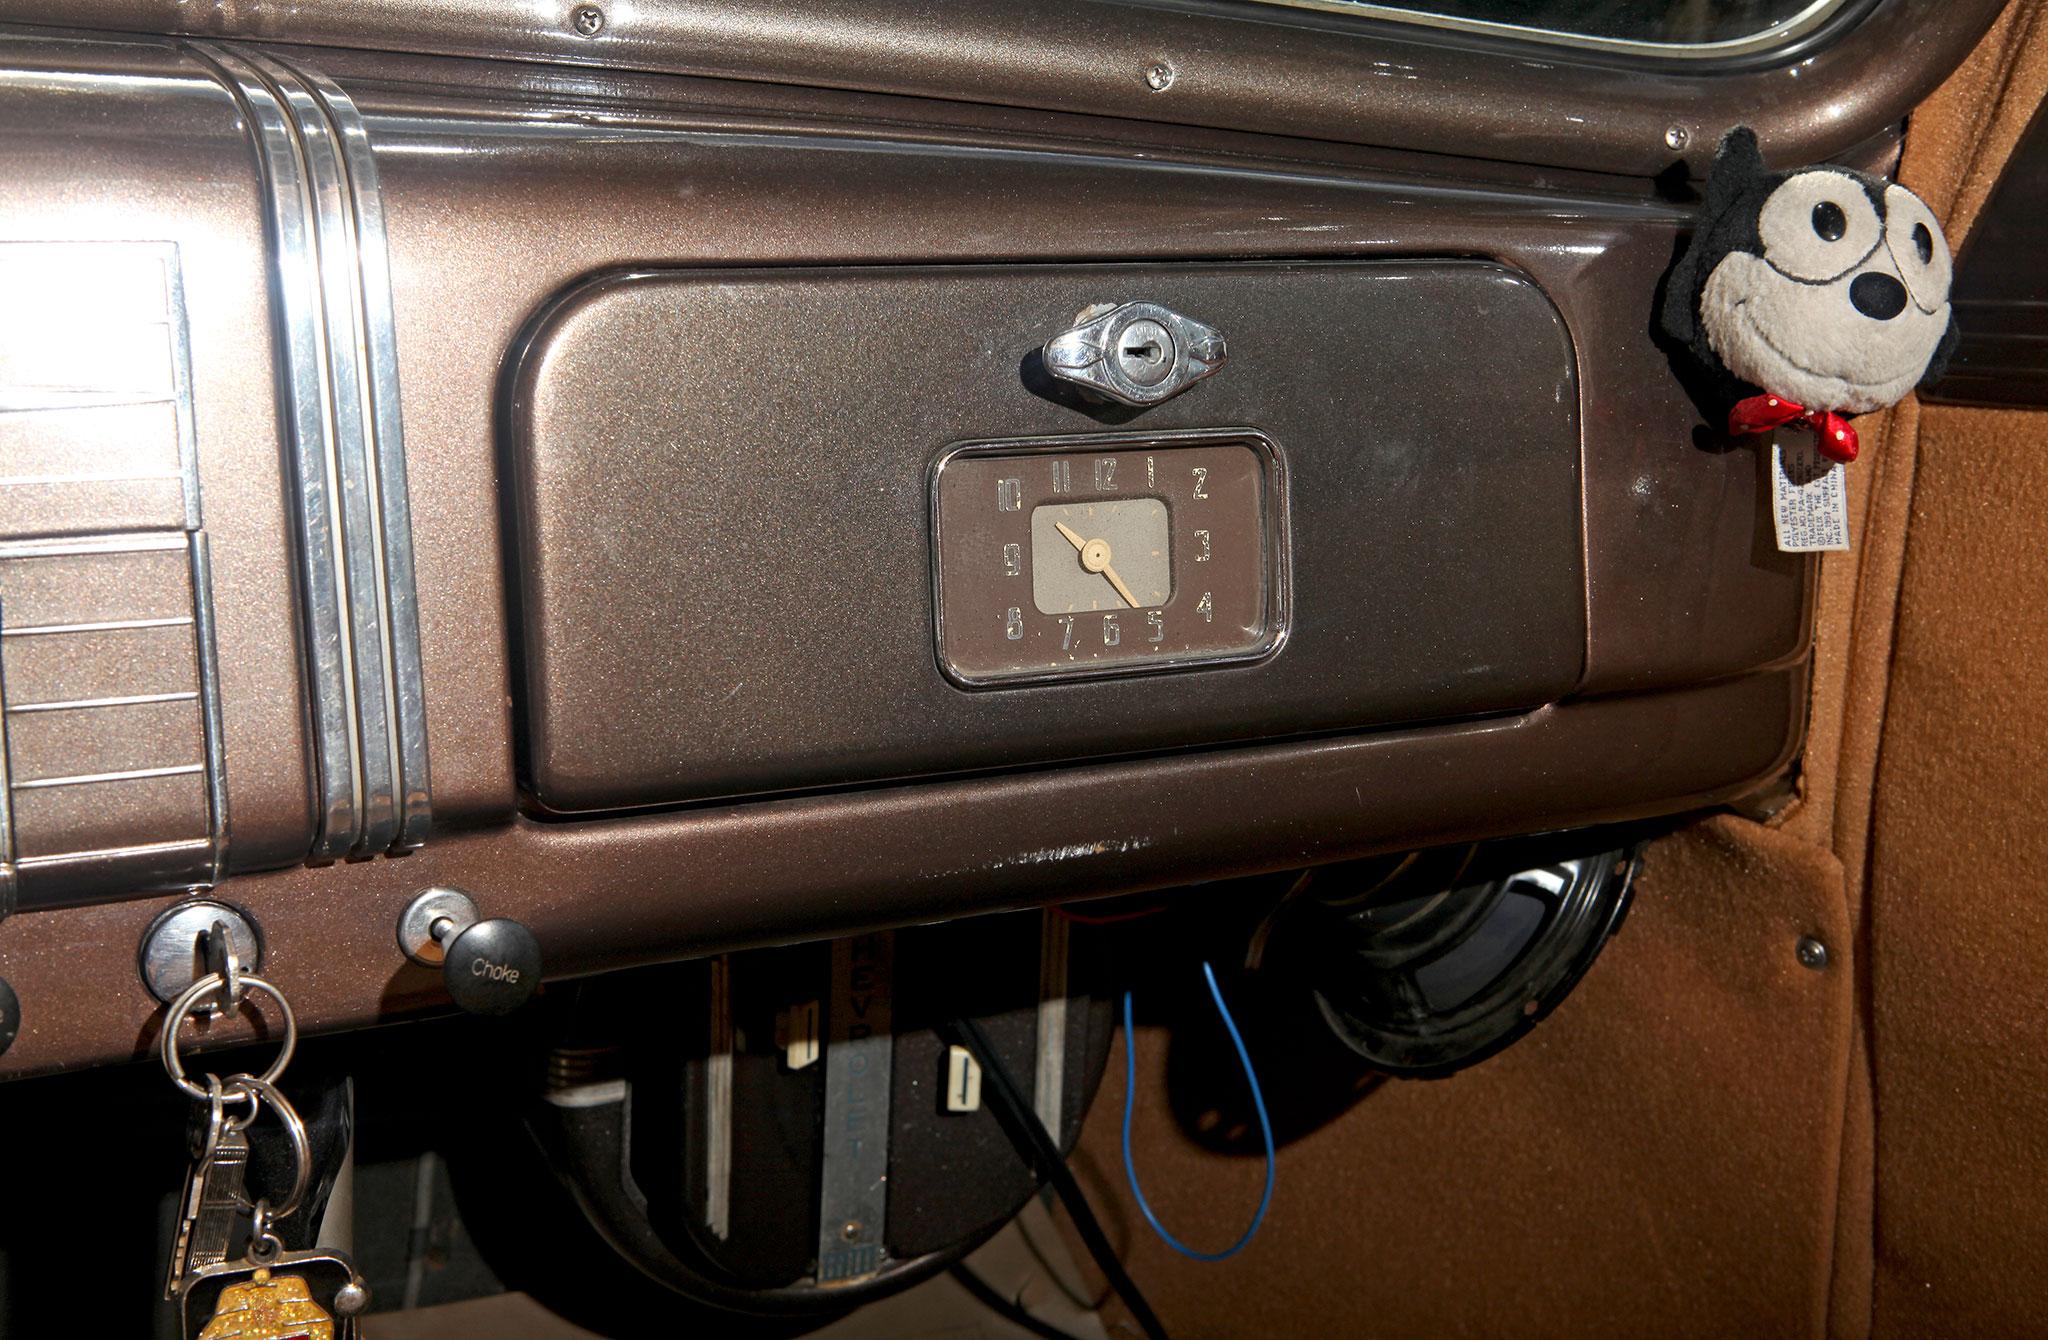 1937 Chevrolet Master Deluxe - Black '37